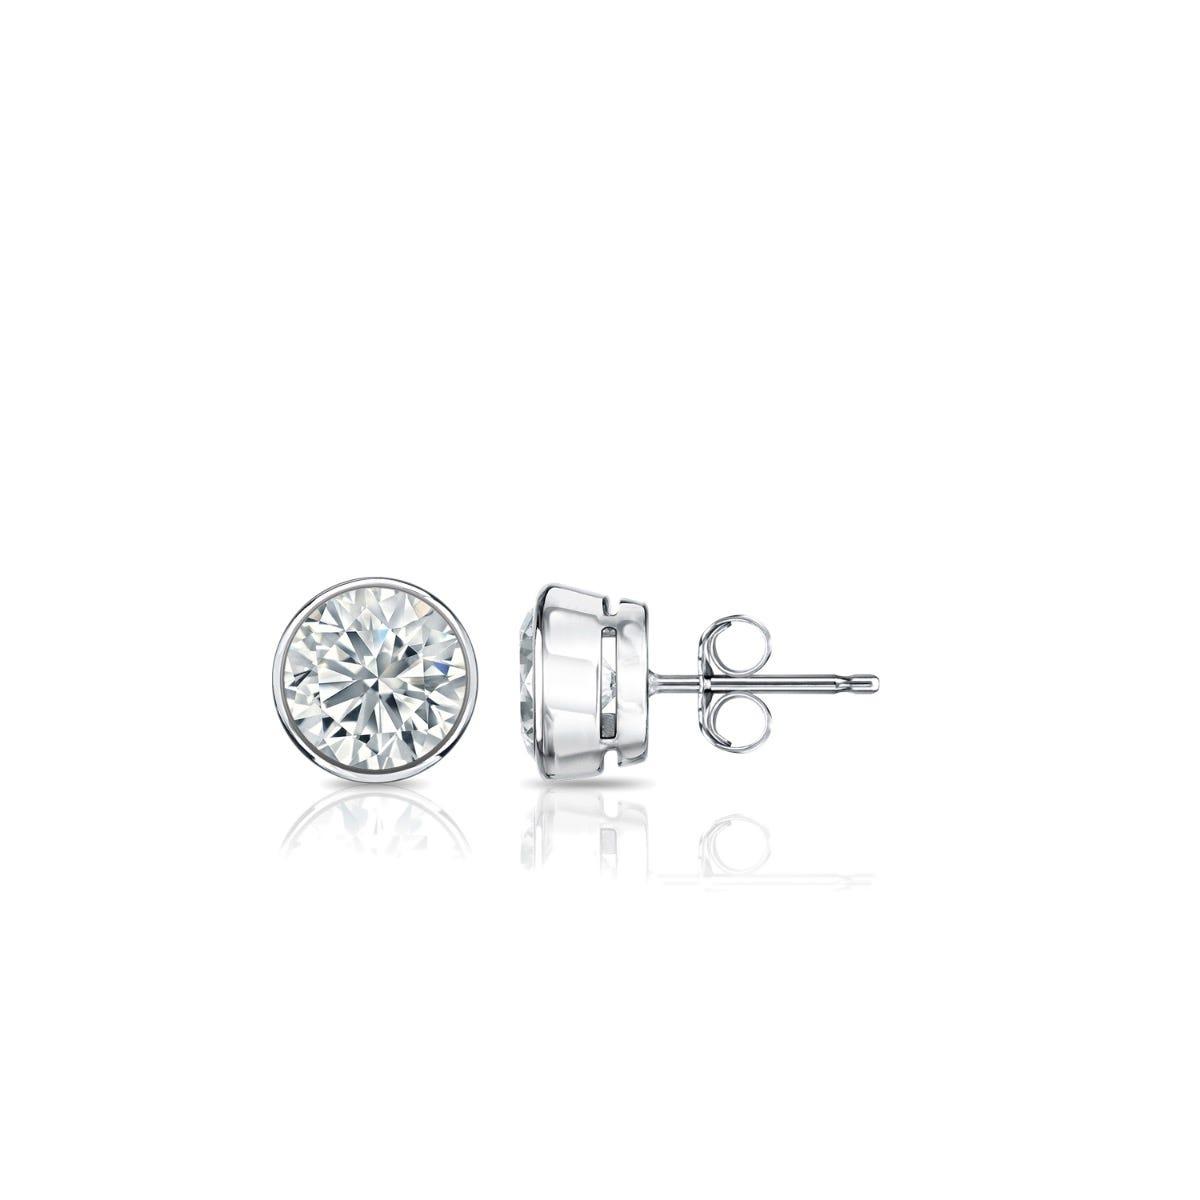 Diamond Round Bezel-Set 1/3ctw. Solitaire Stud (IJ-VS2) Earrings in Platinum